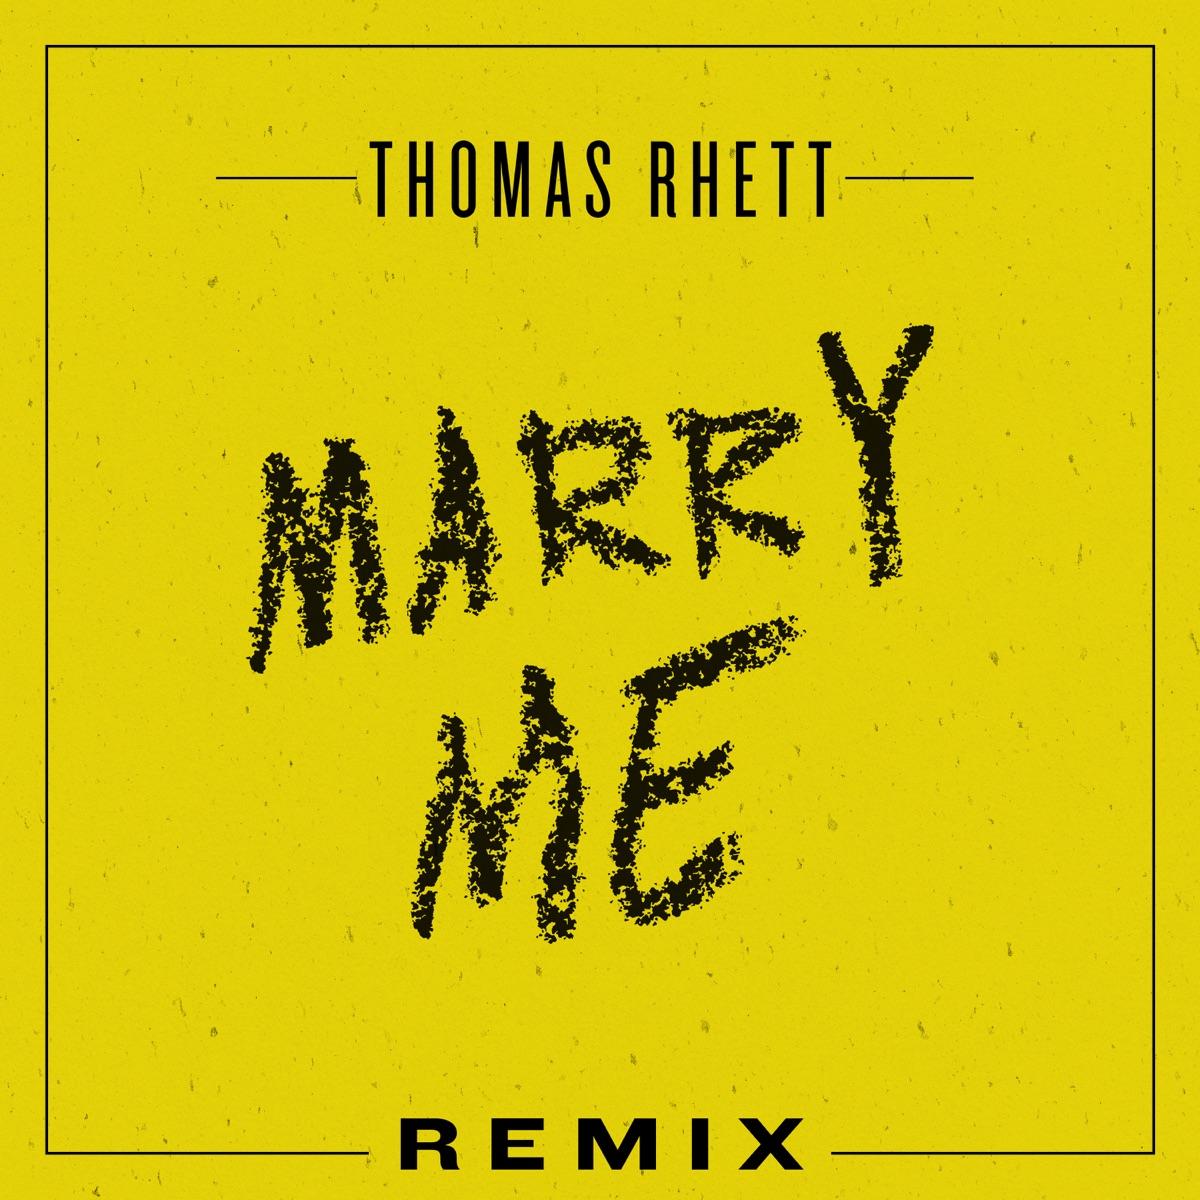 Marry Me Remix - Single Thomas Rhett CD cover